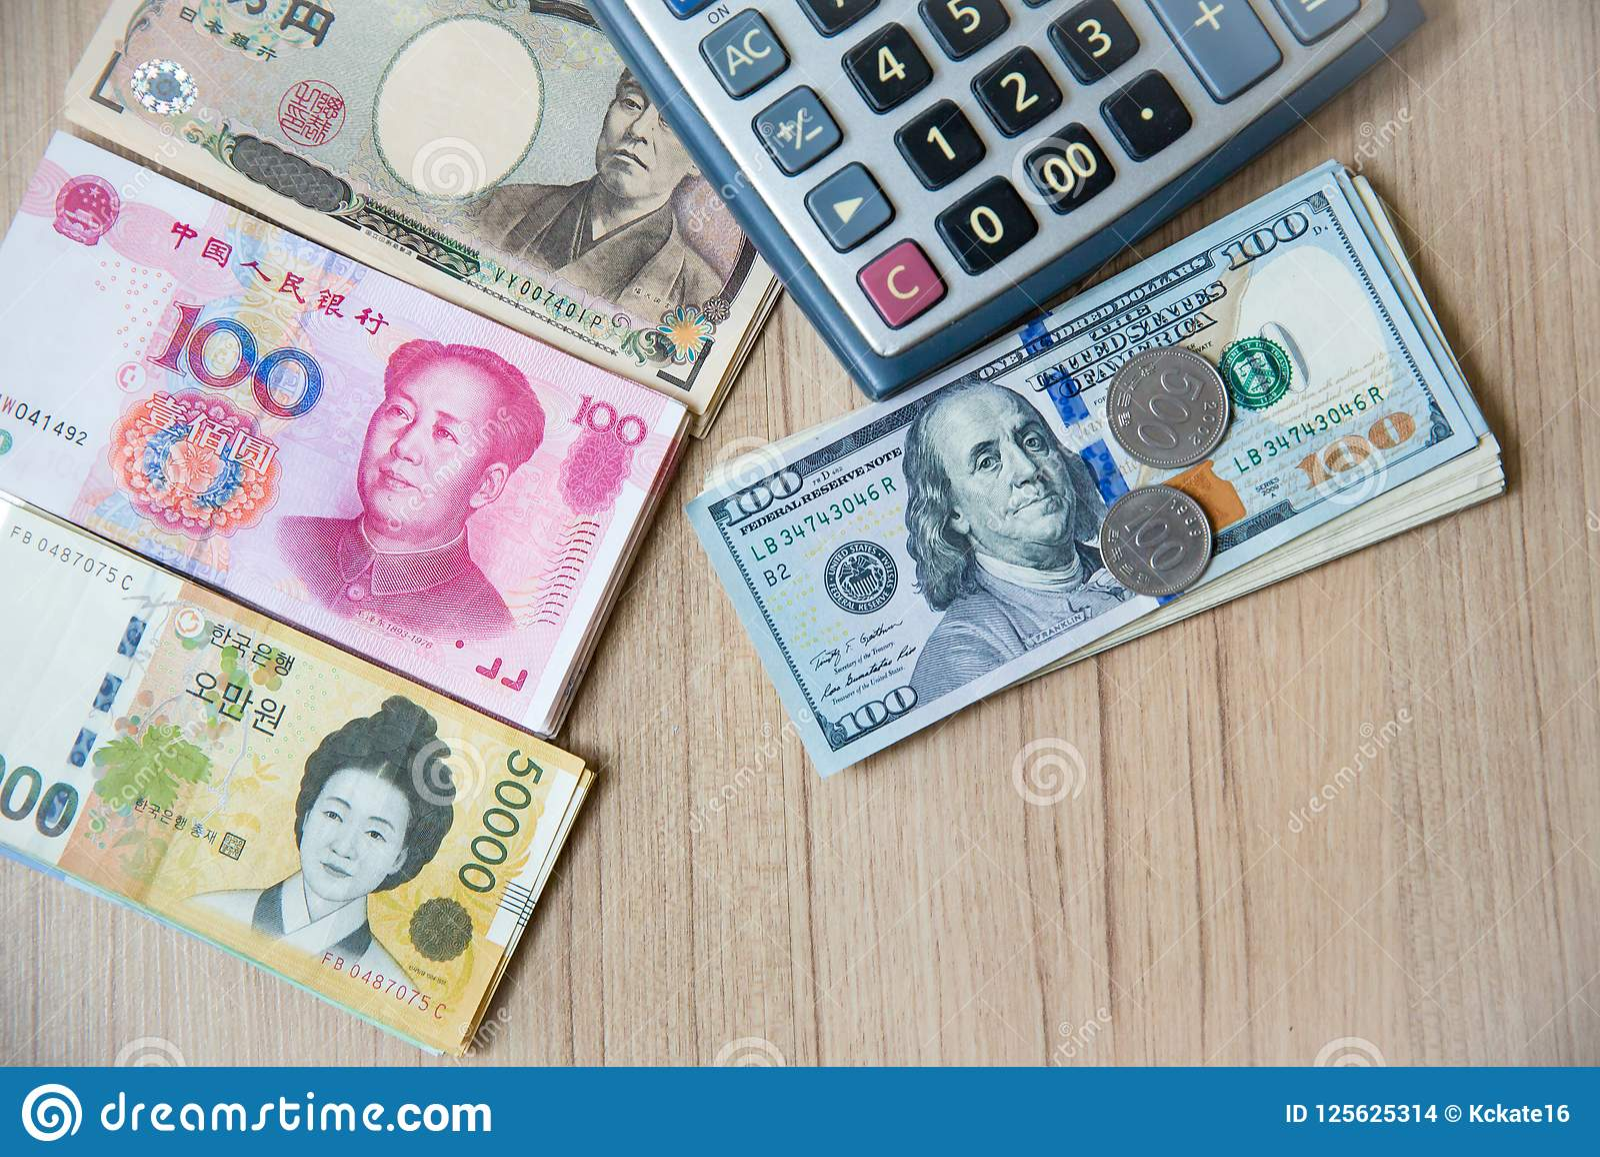 Many Banknote Currency, Yen-Japan,euro-EU,yuan-China, Won-Korea With Calculator And Coins. Image ...